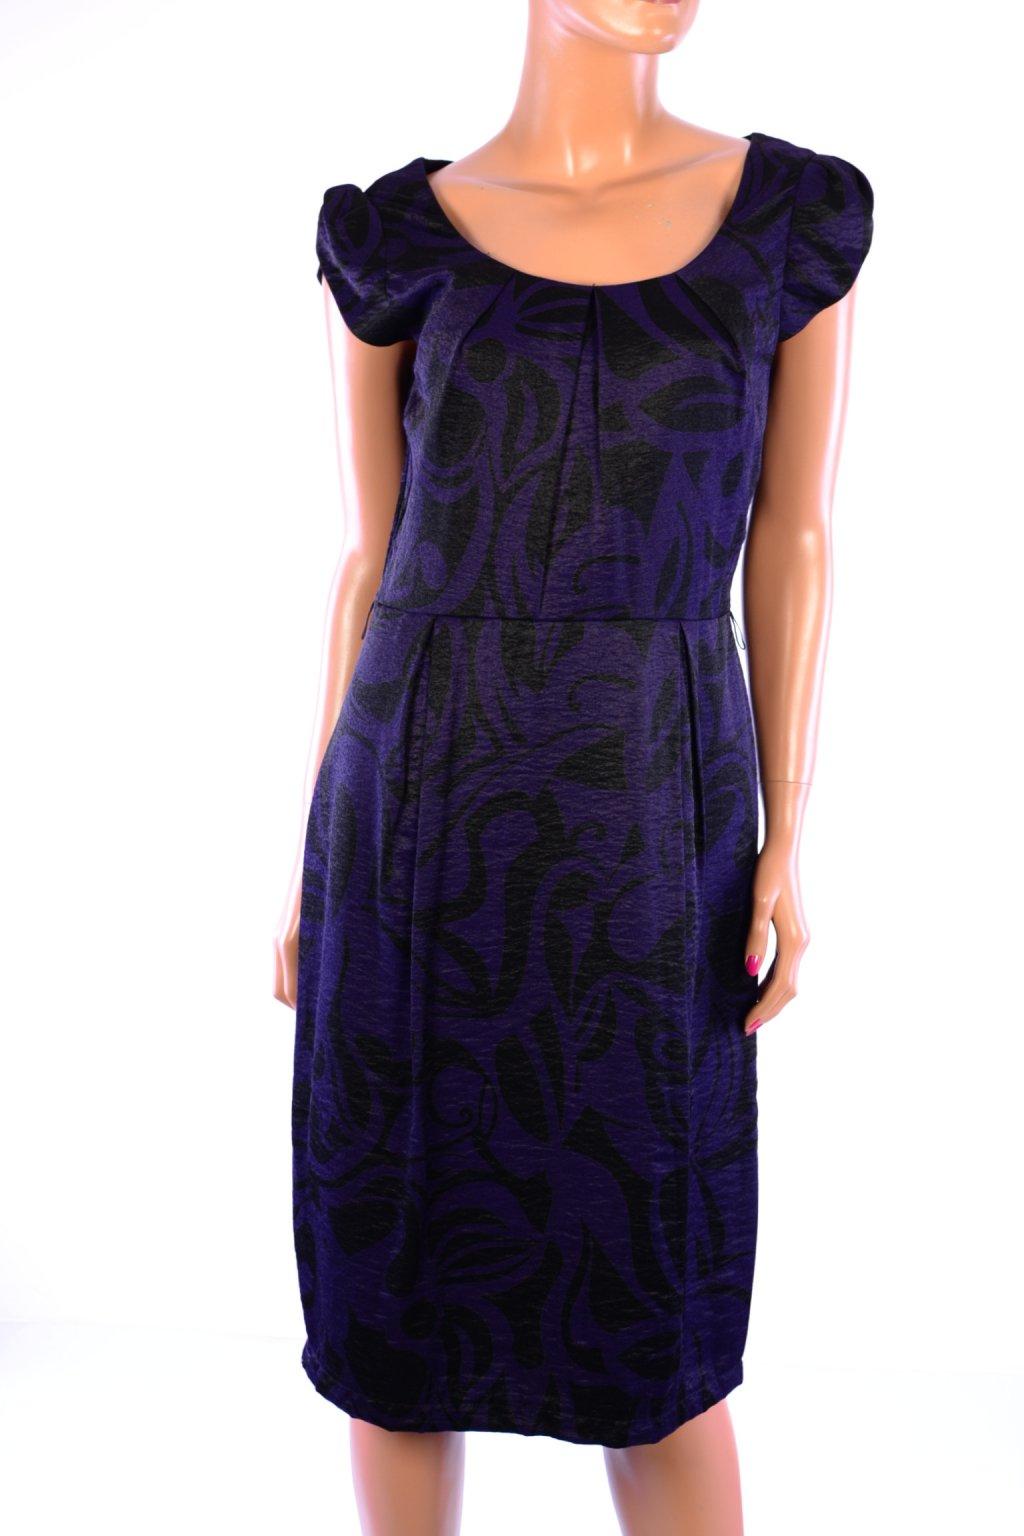 Šaty Marks&Spencer fialové vzorované vel. M / uk 12